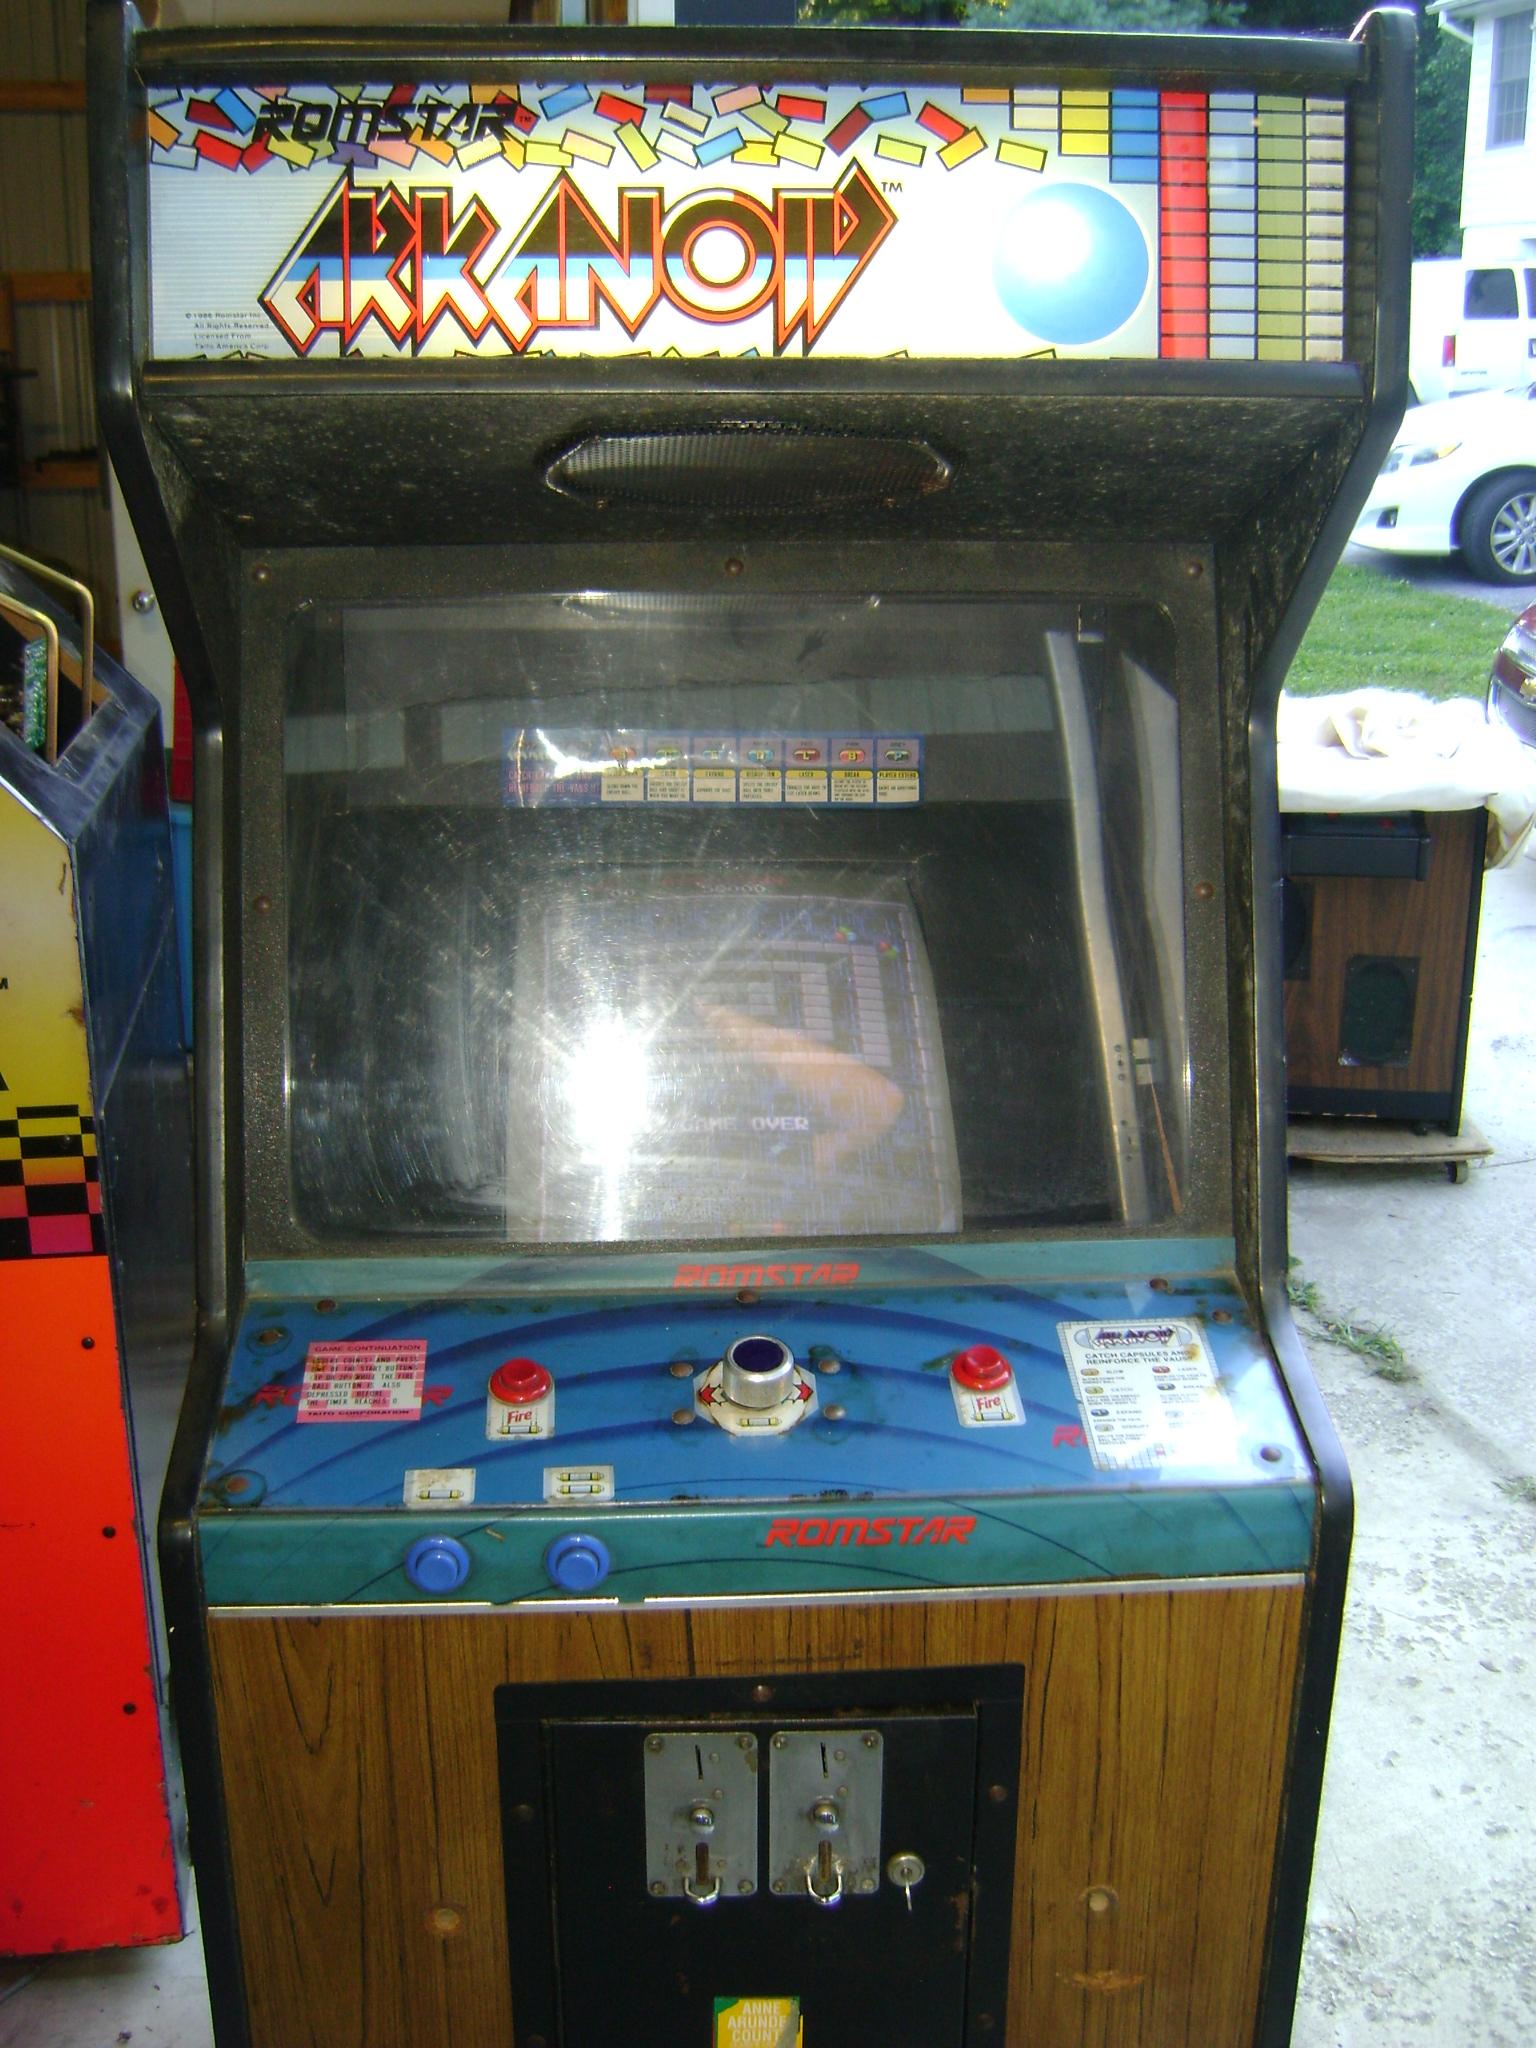 arkanoid arcade machine